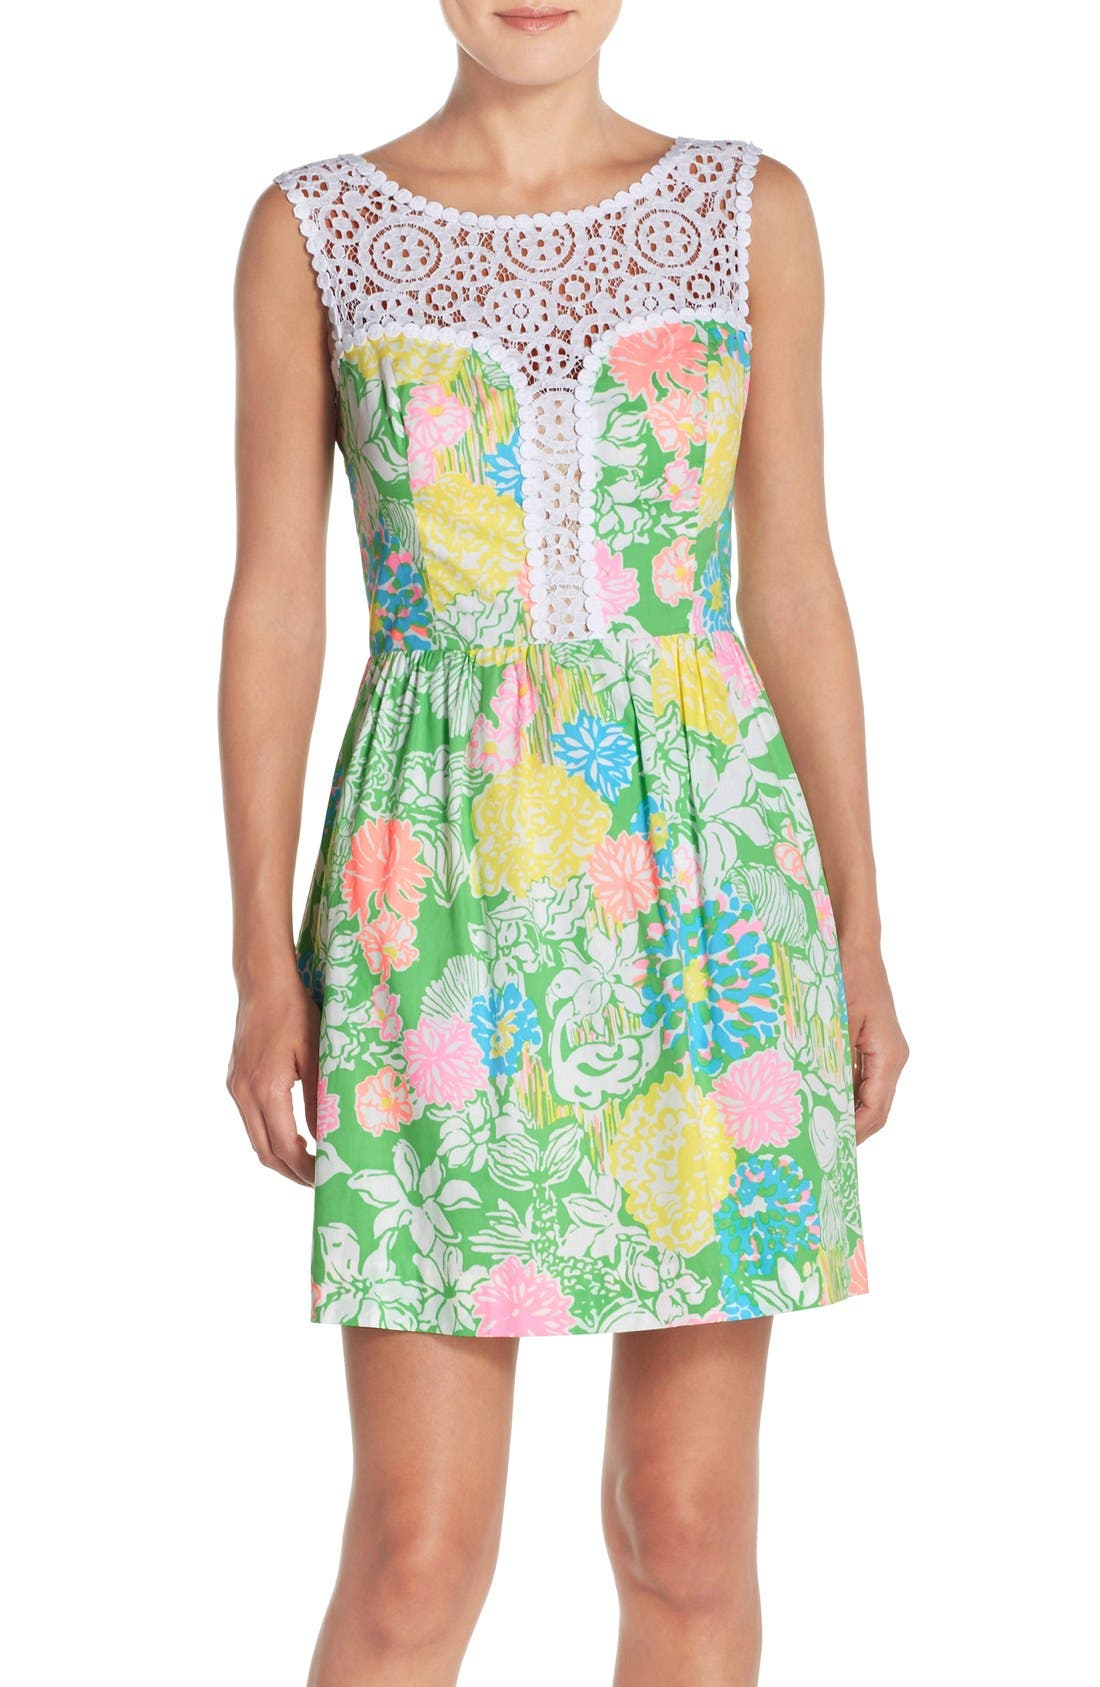 Main Image - Lilly Pulitzer® 'Raegan' Cotton Fit & Flare Dress